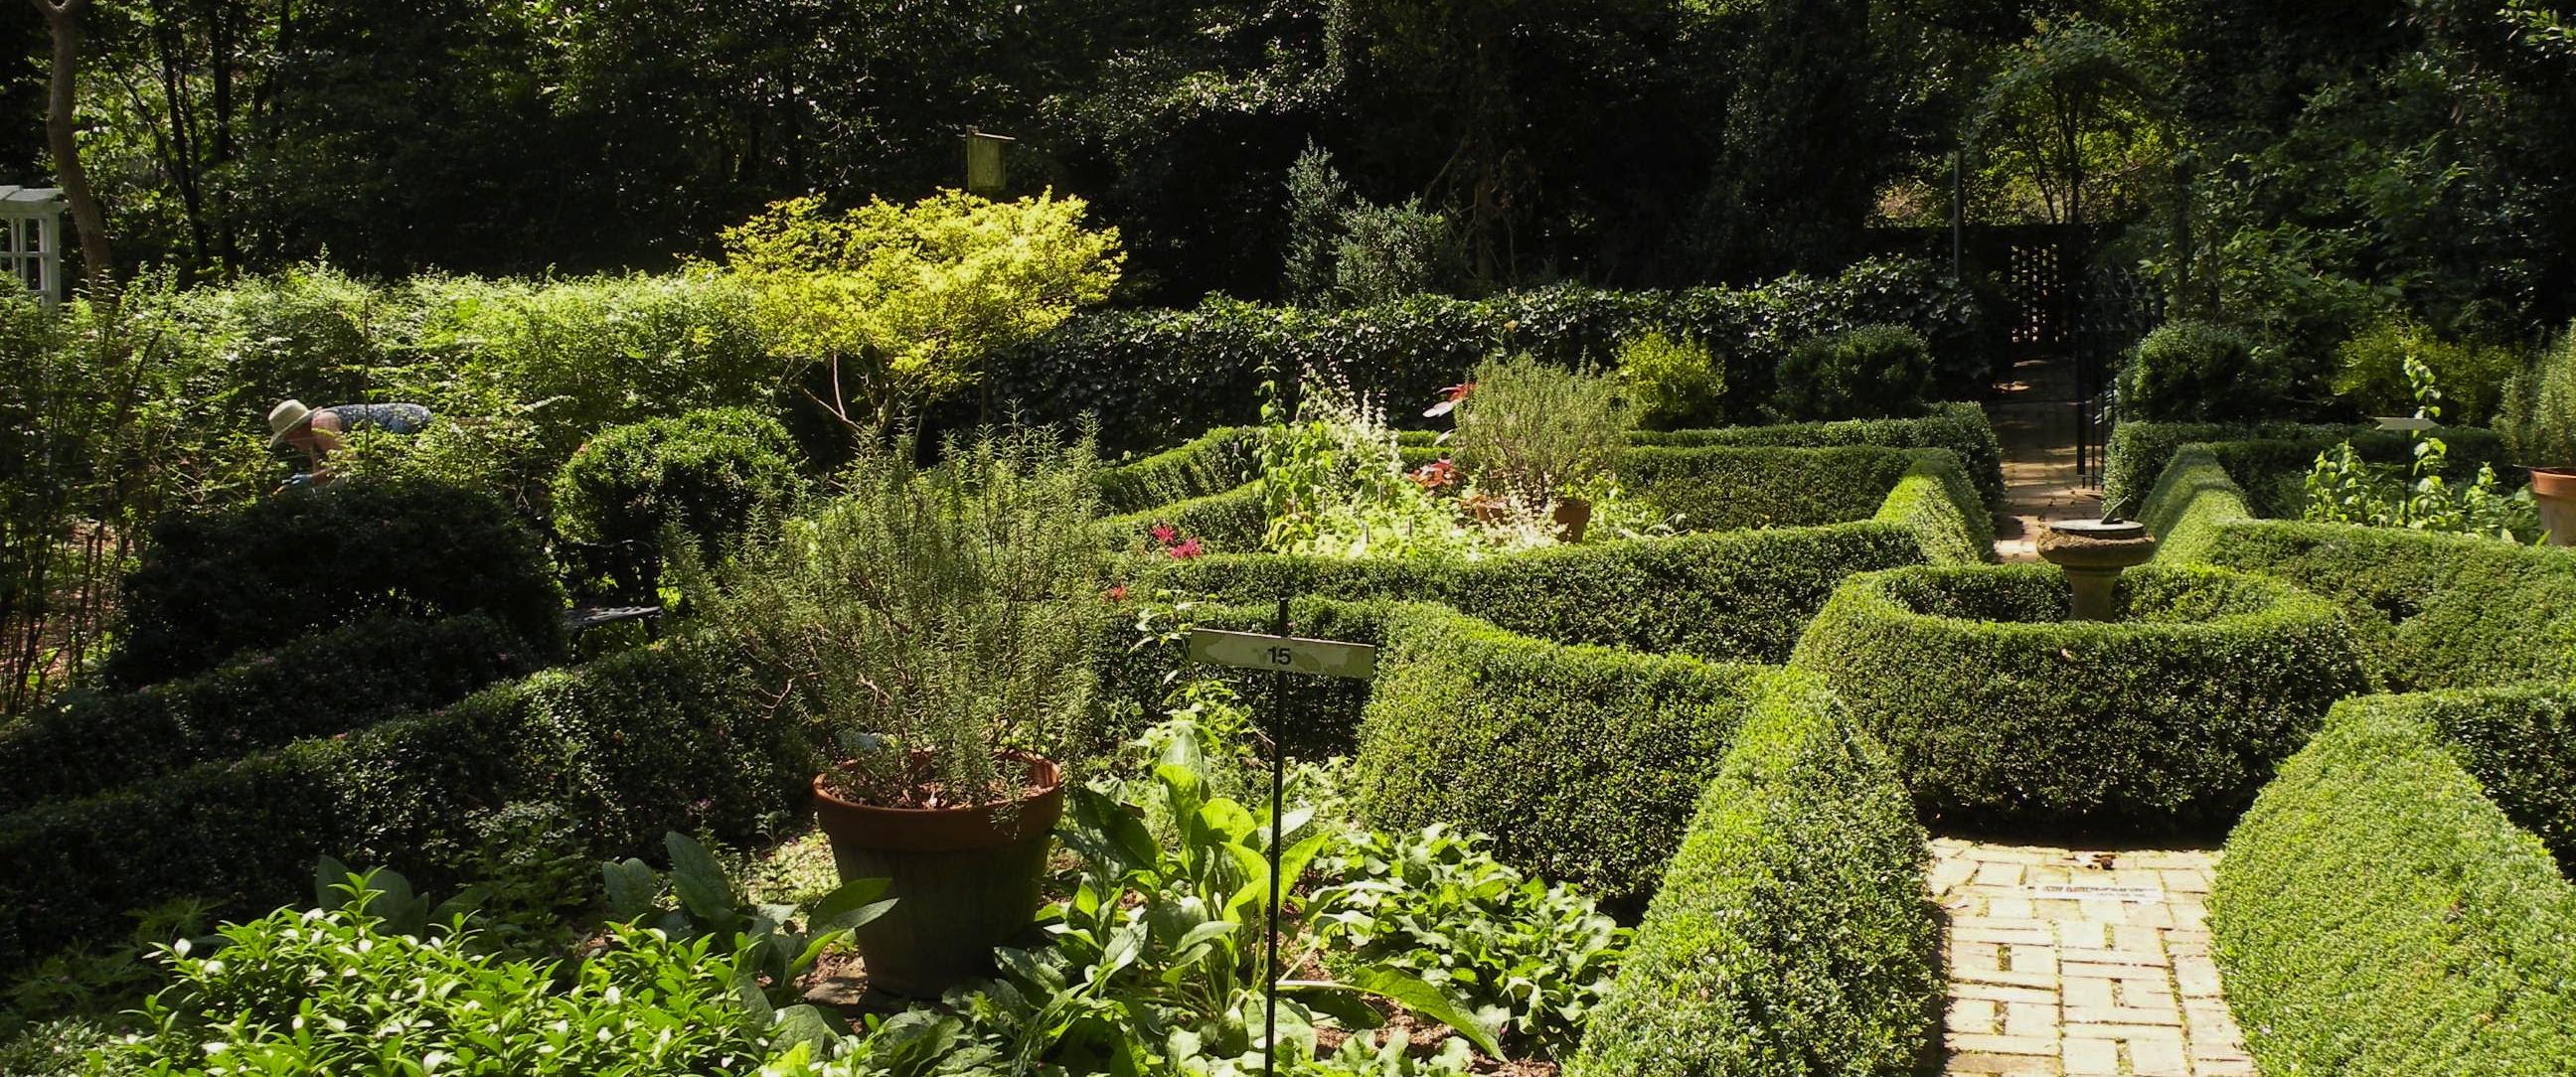 Charlotte's Hidden Gardens